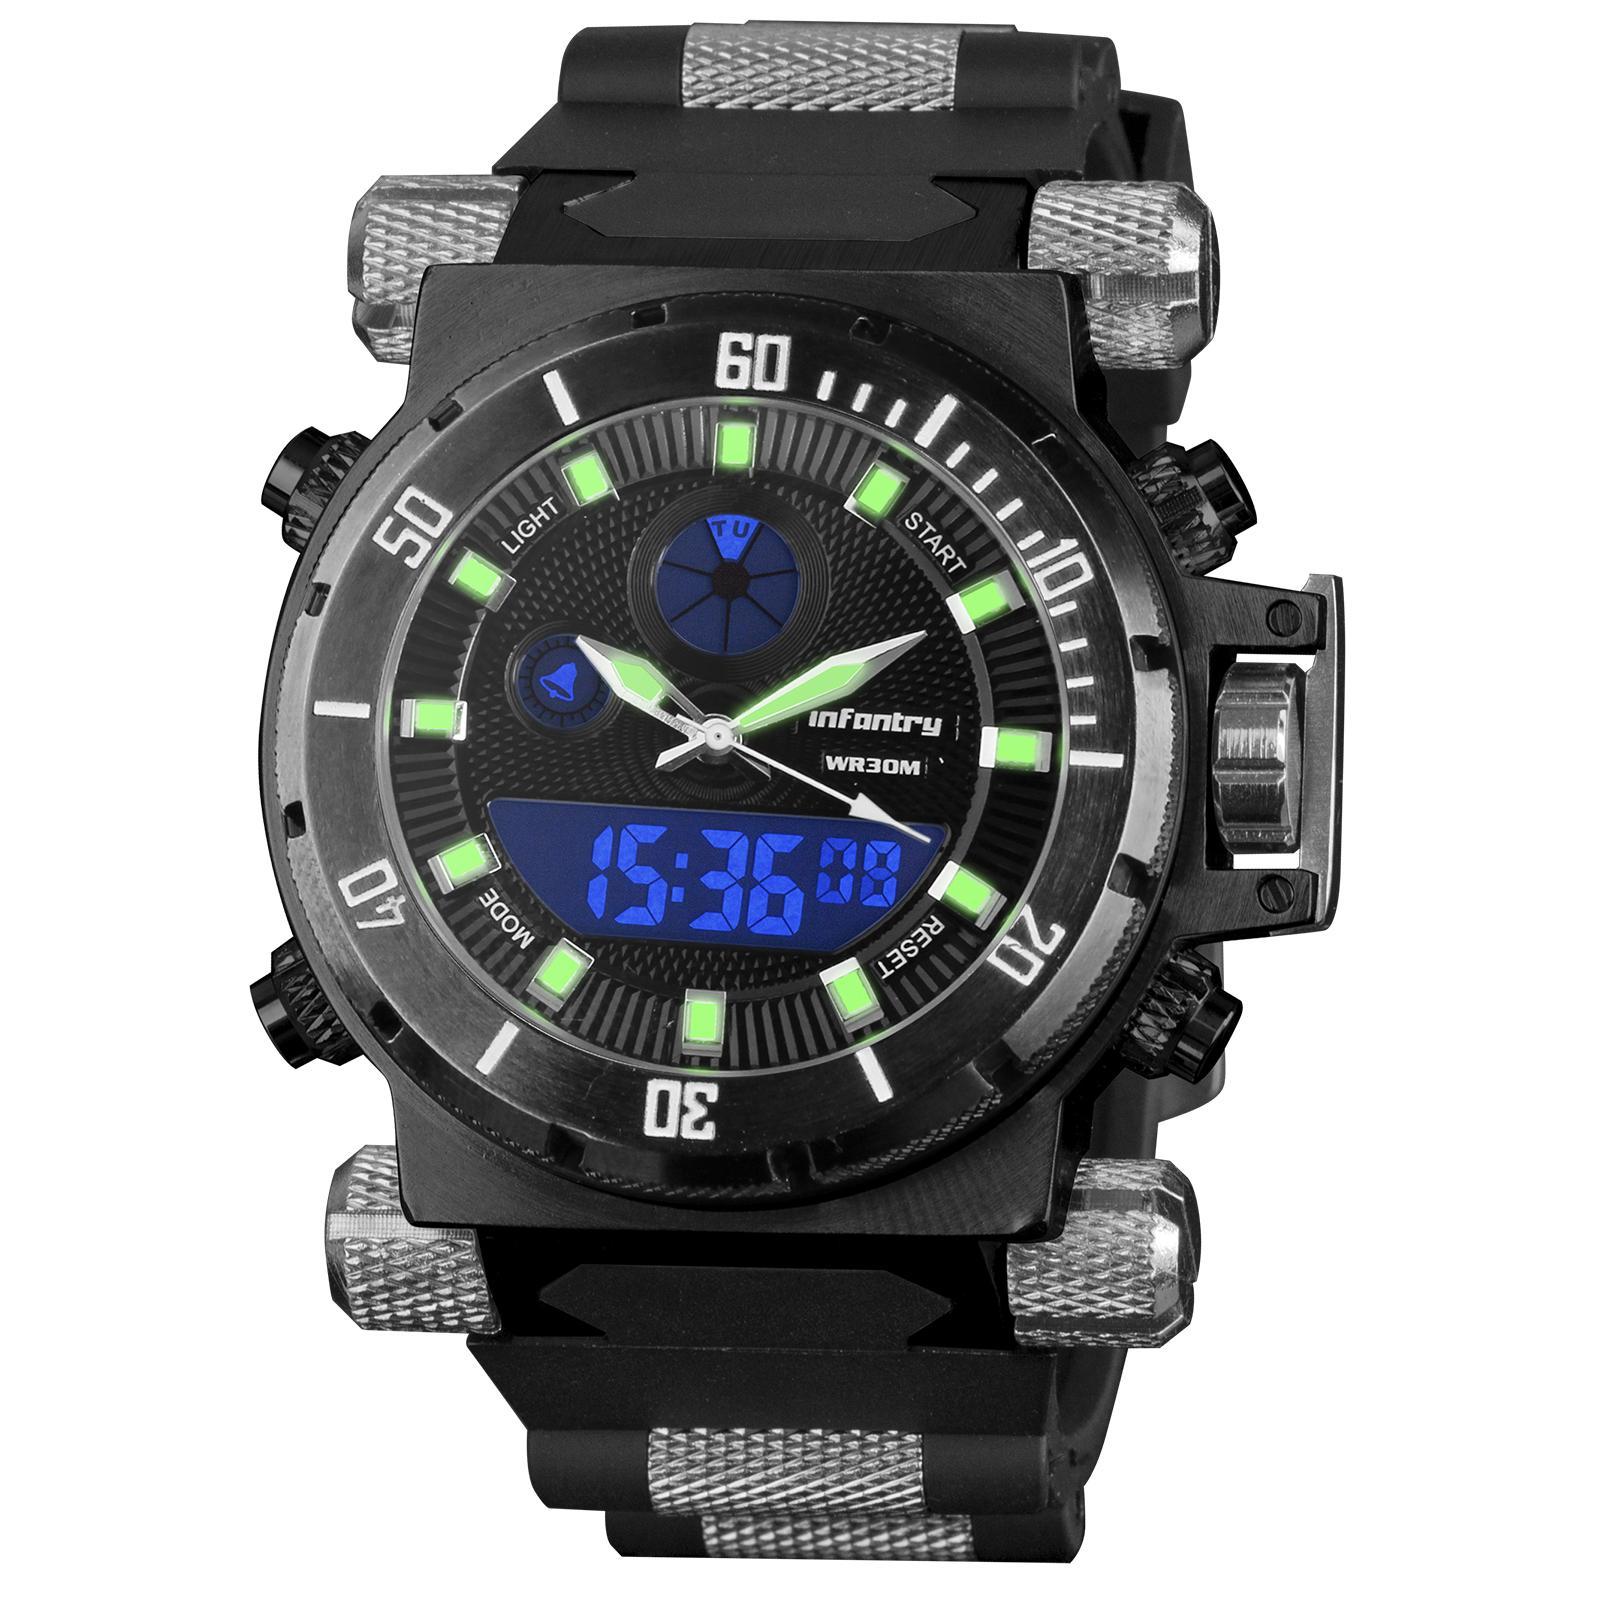 3d62e92c568a Infantry Mens Digital Quartz Wrist Watch Stopwatch Alarm Sport LCD  Chronograph(Black)